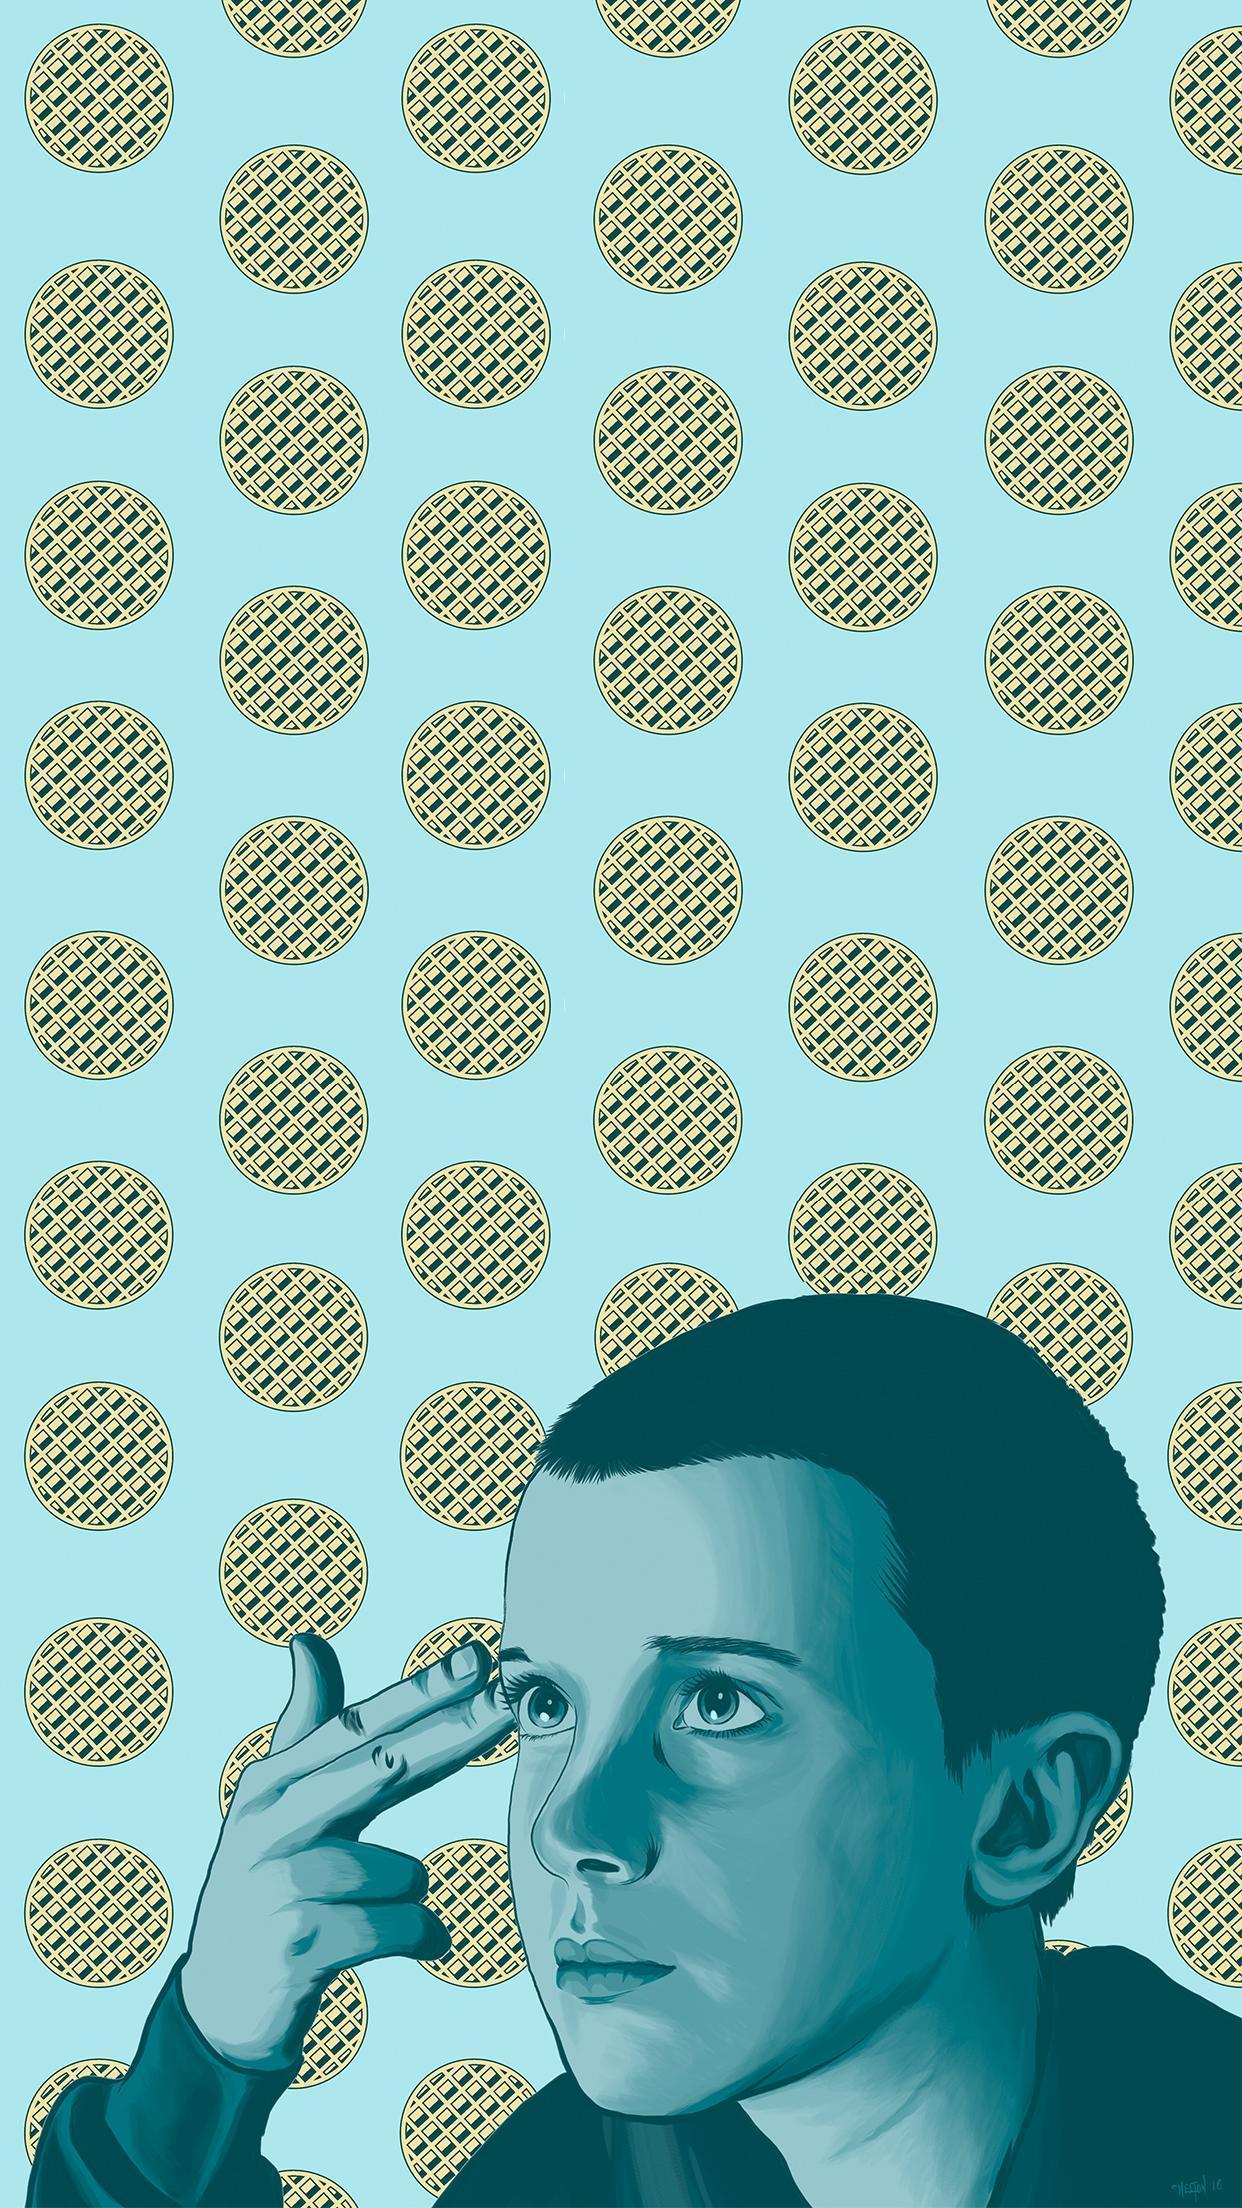 Stranger Things Wallpapers - Wallpaper Cave